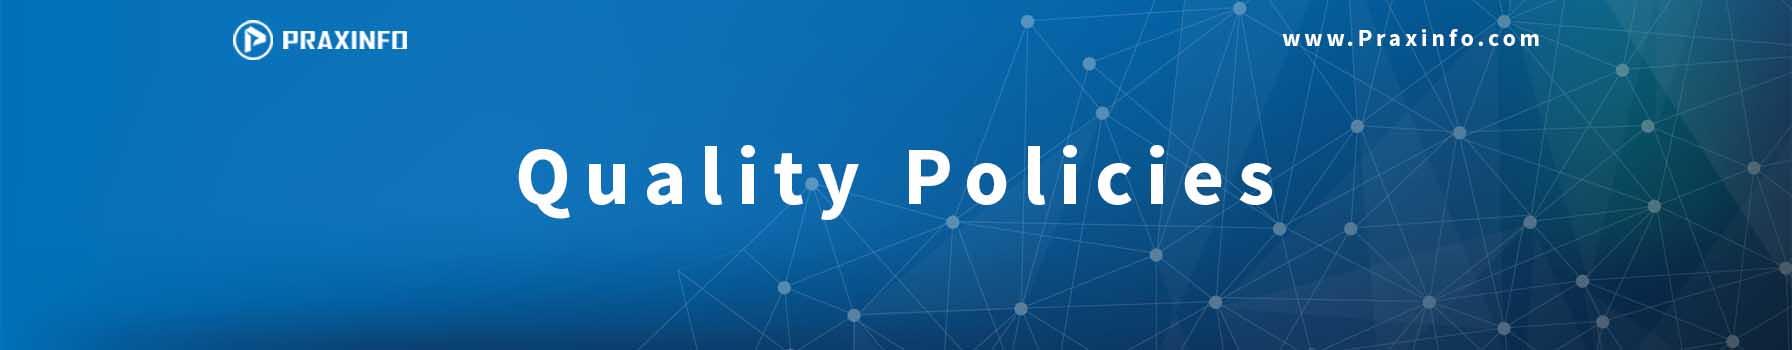 quality-policies.jpg